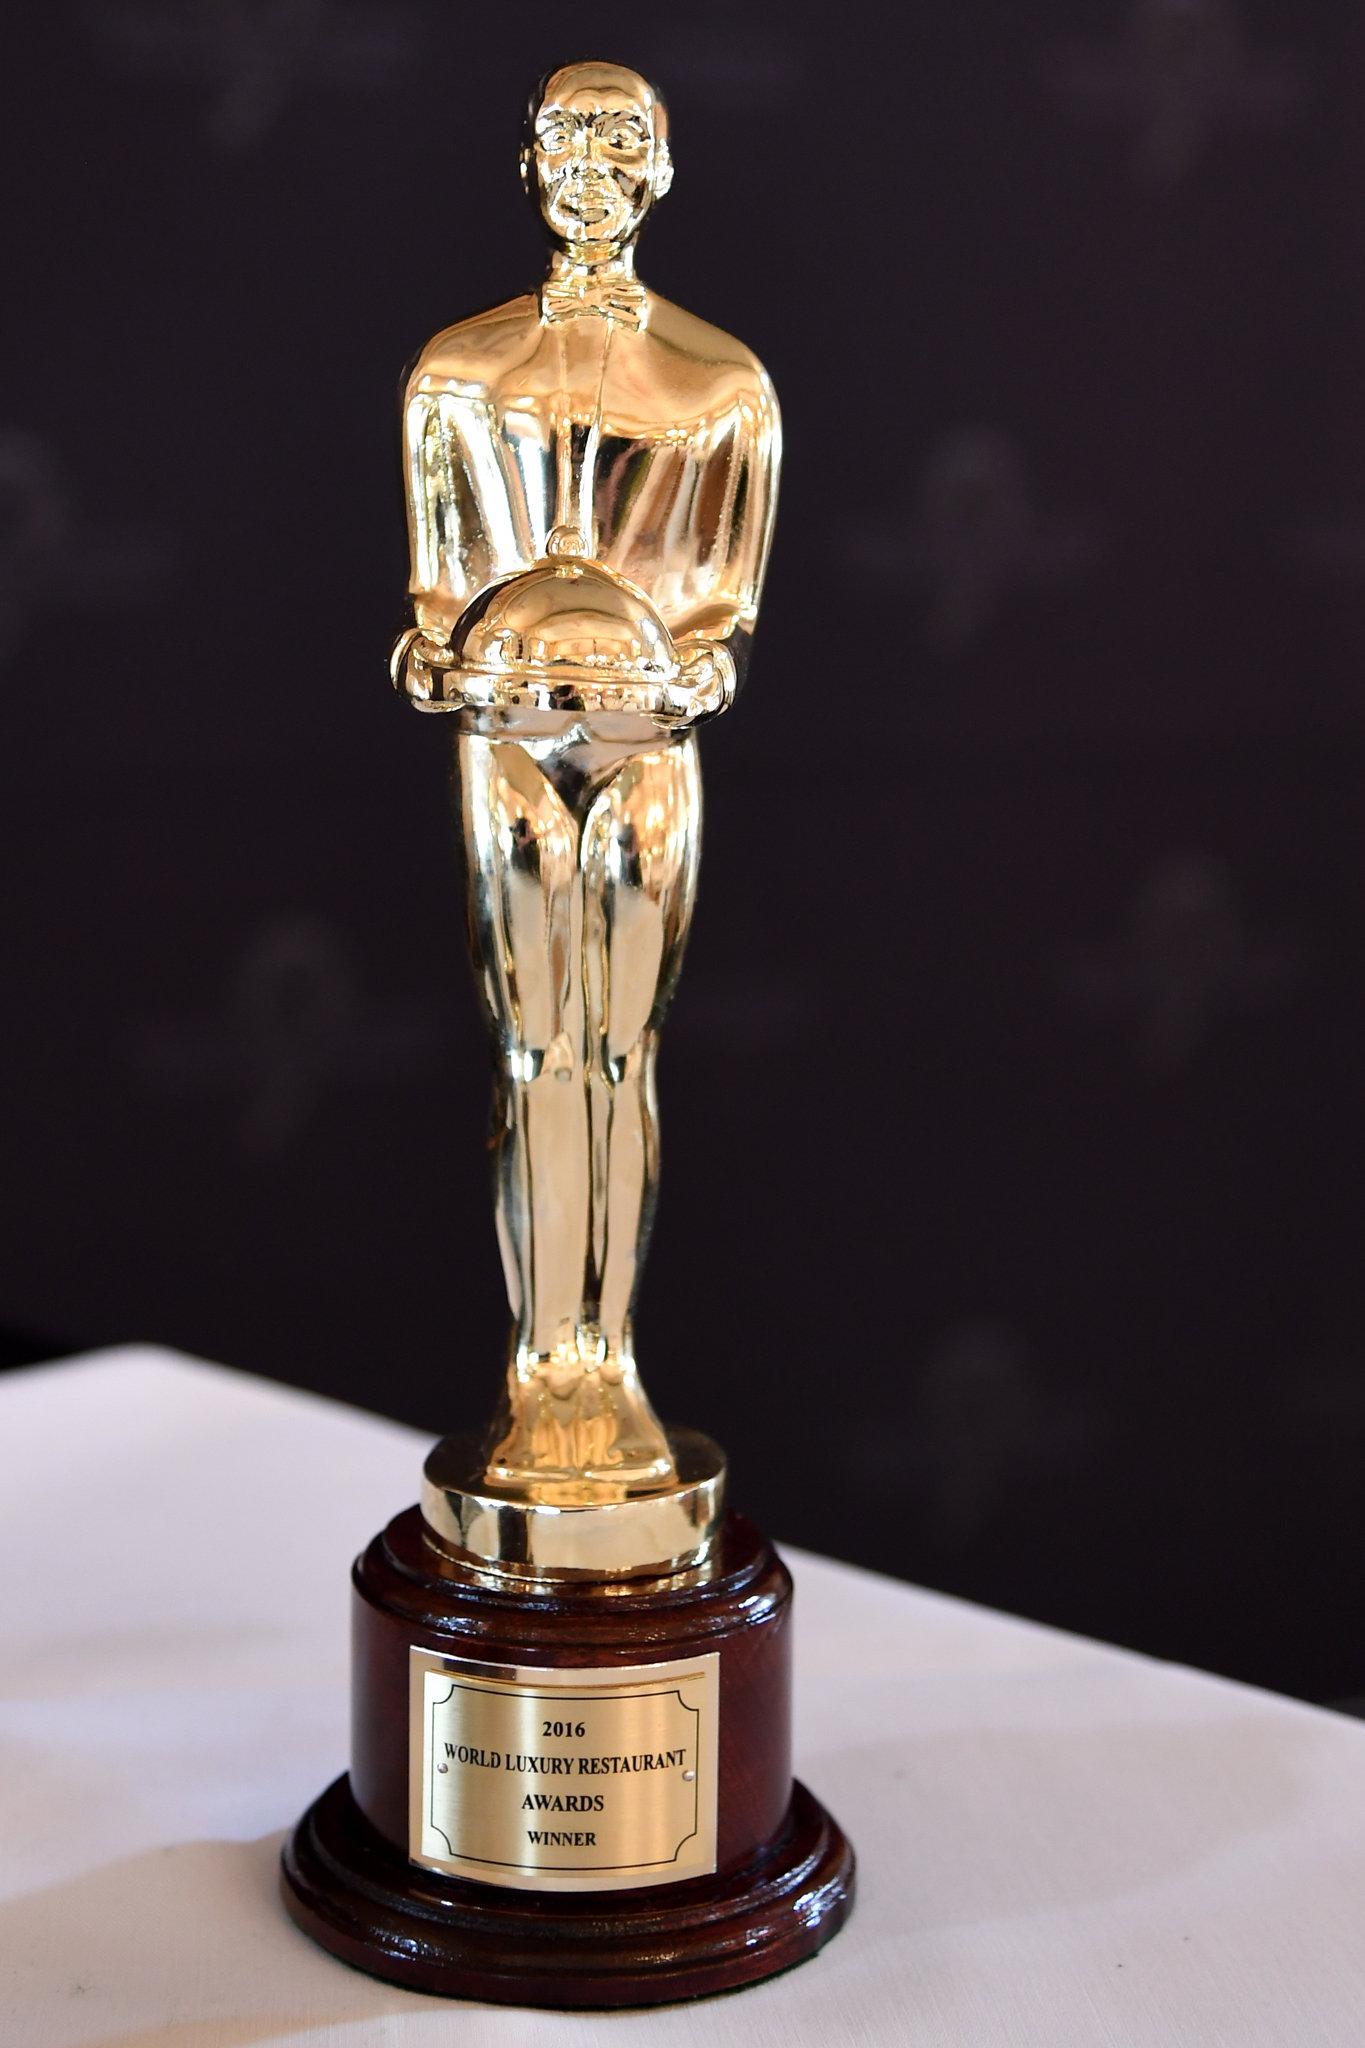 Privo, premiat la World Luxury Restaurant Awards